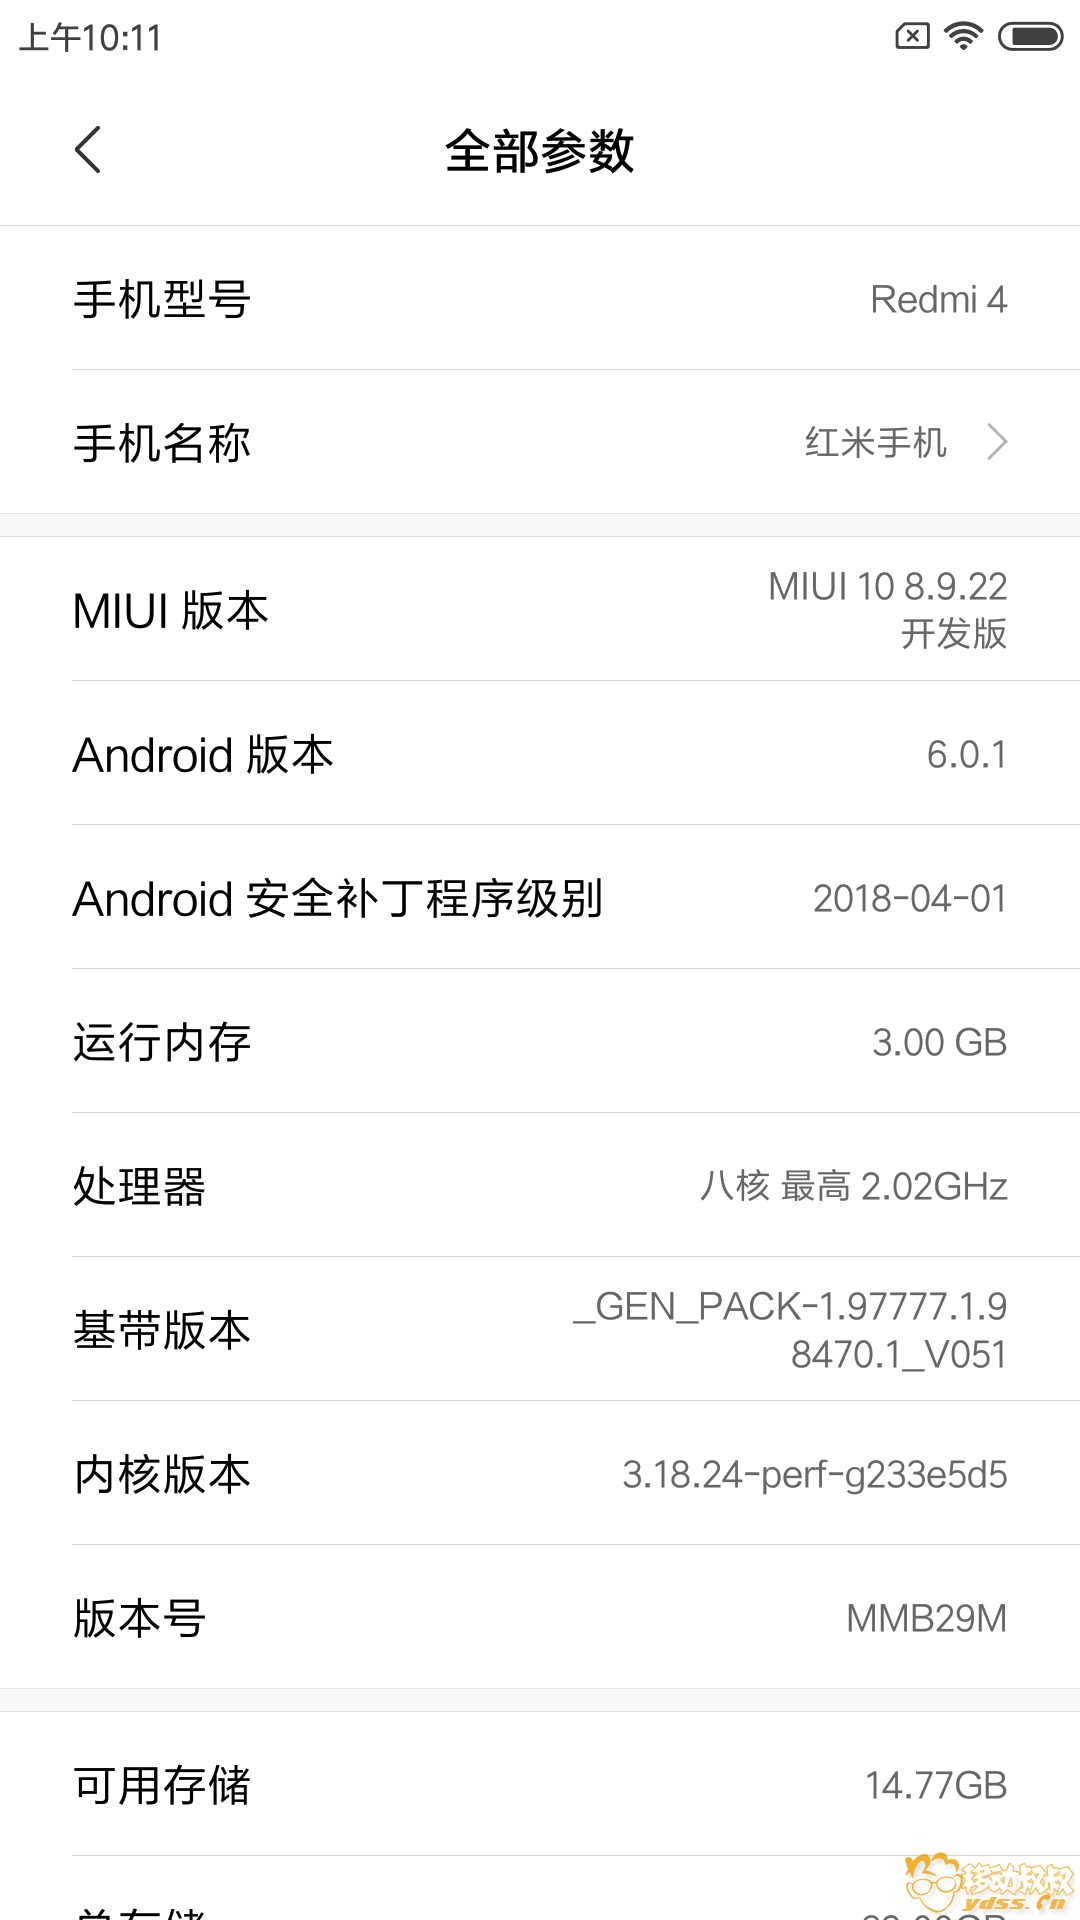 Screenshot_2018-09-23-10-11-53-871_com.android.settings.png